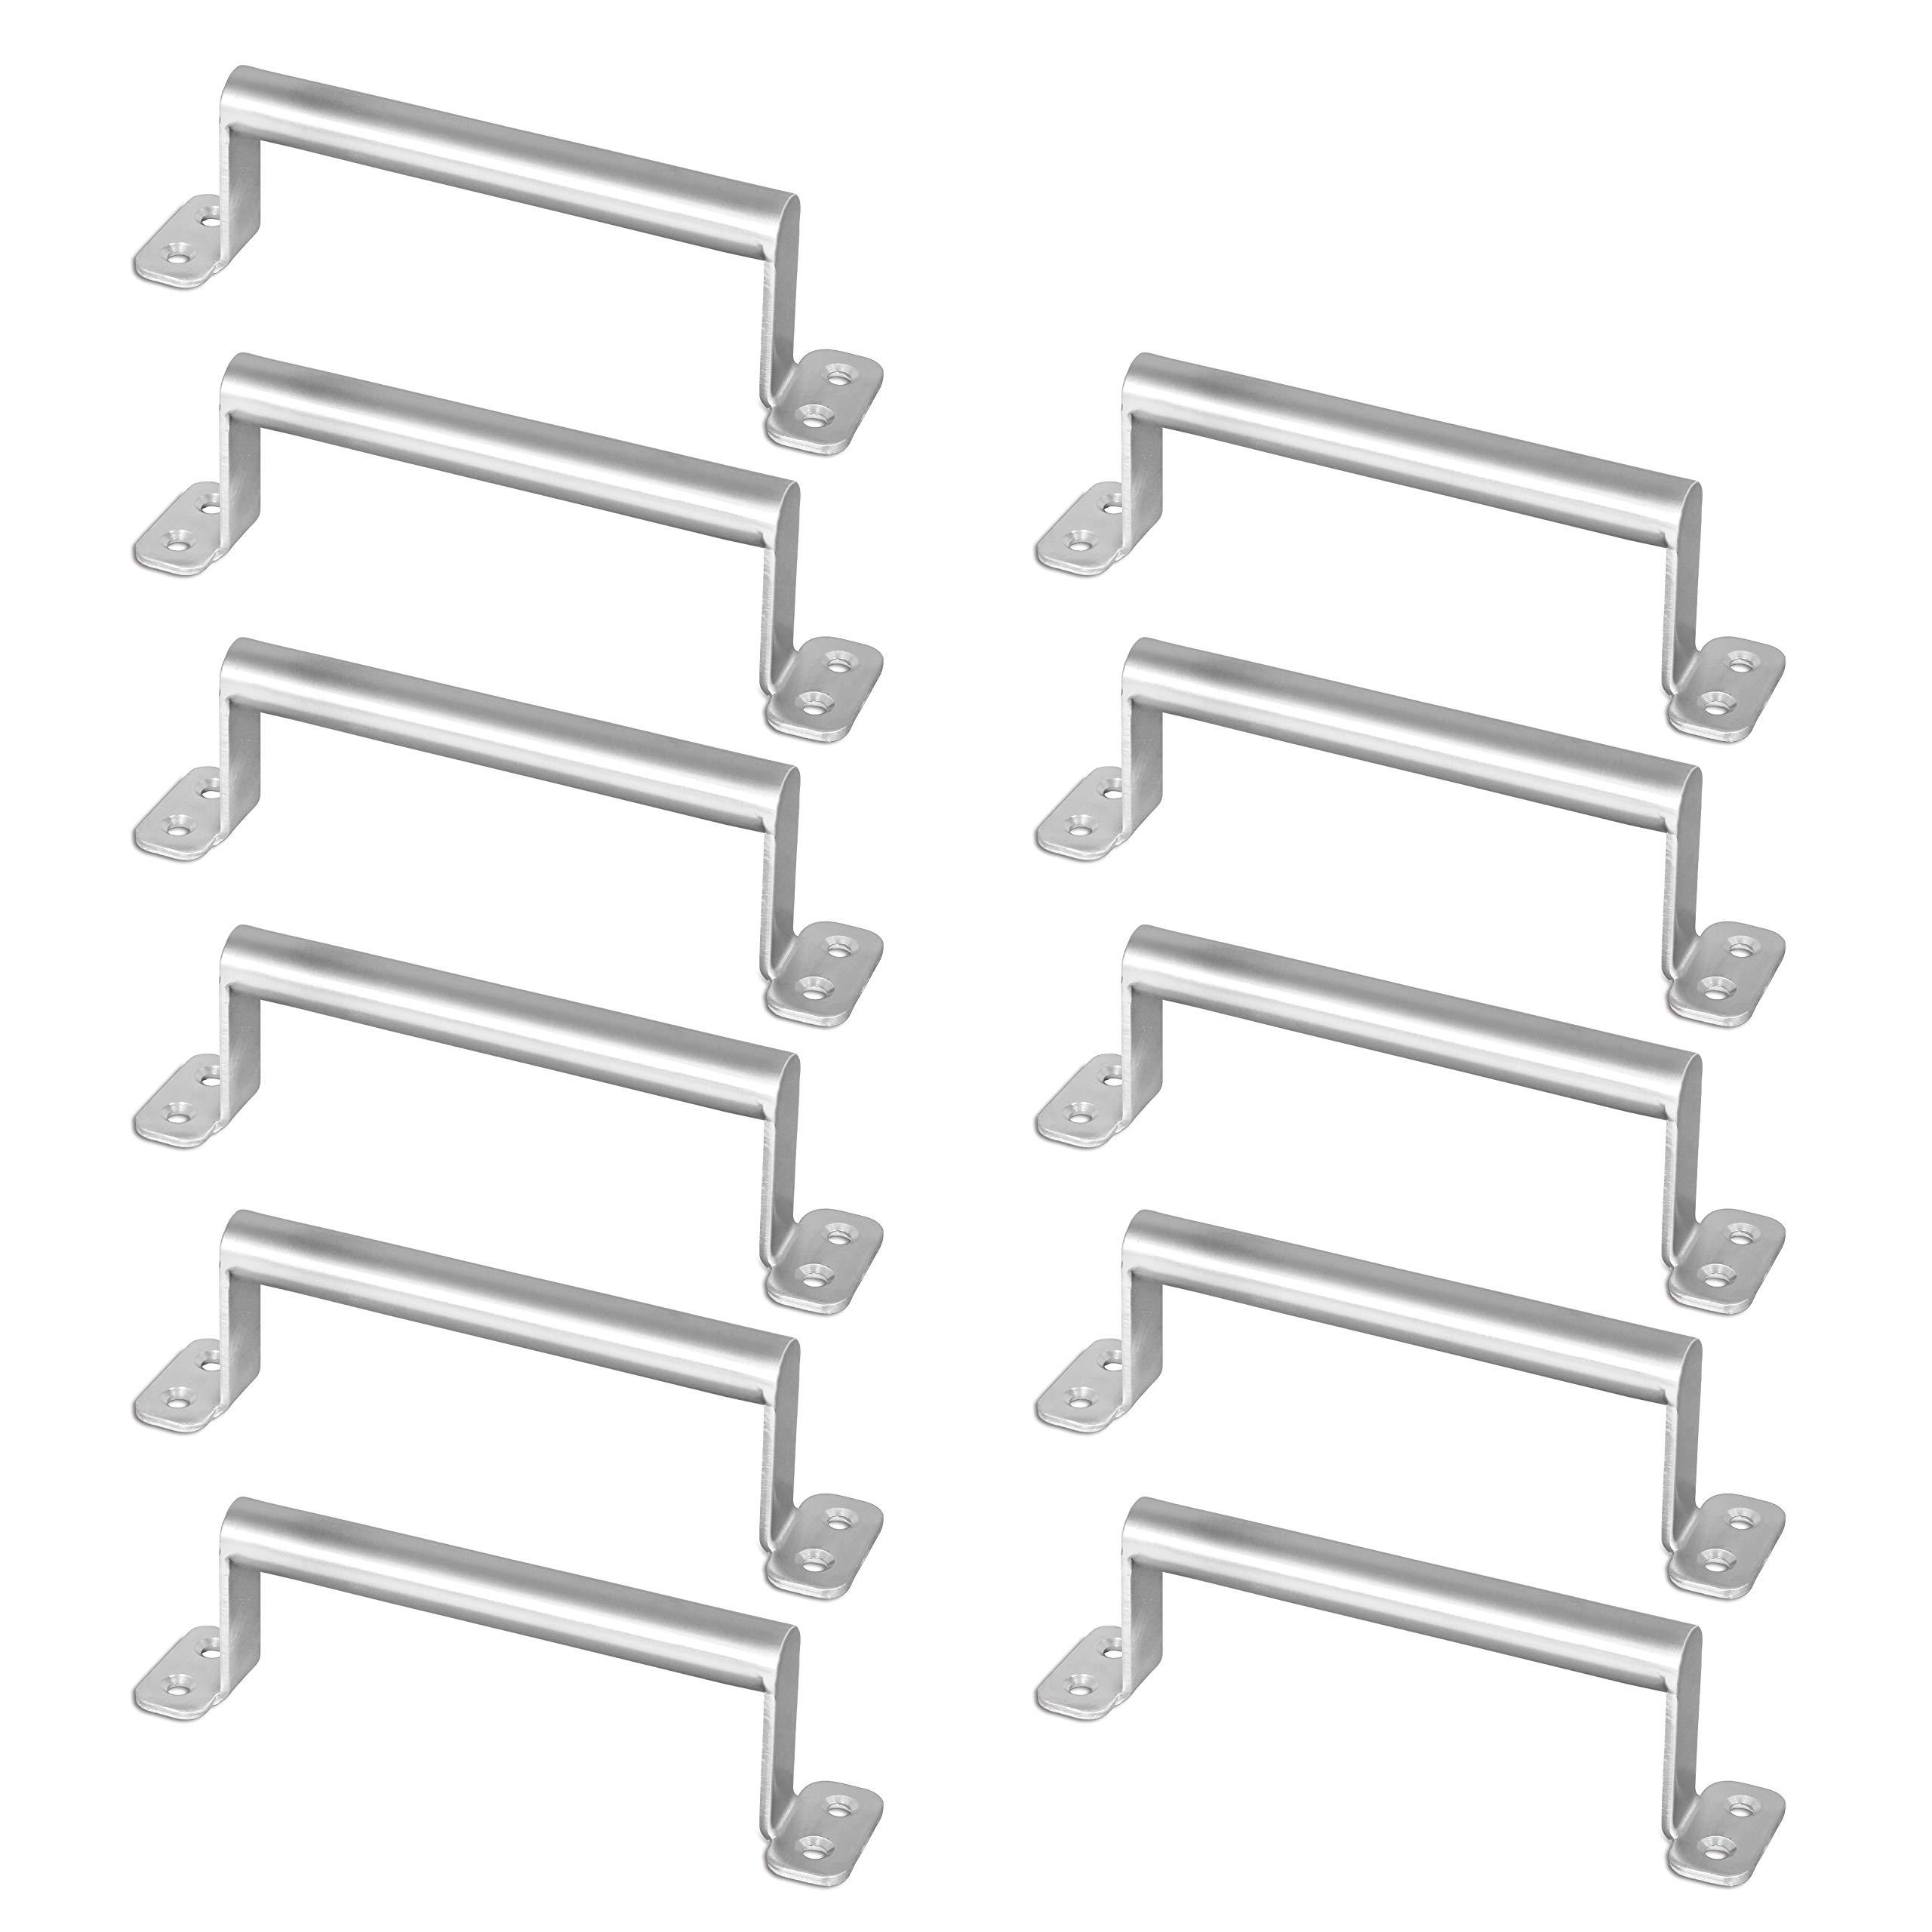 WEBI Barn Door Handle, 5.7'' Stainless Steel Center-to-Center Door Pull,Cabinet Knob for Gate,Closet,Bathroom,Drawer, Kitchen Furniture,Brush Nickel,11 Packs